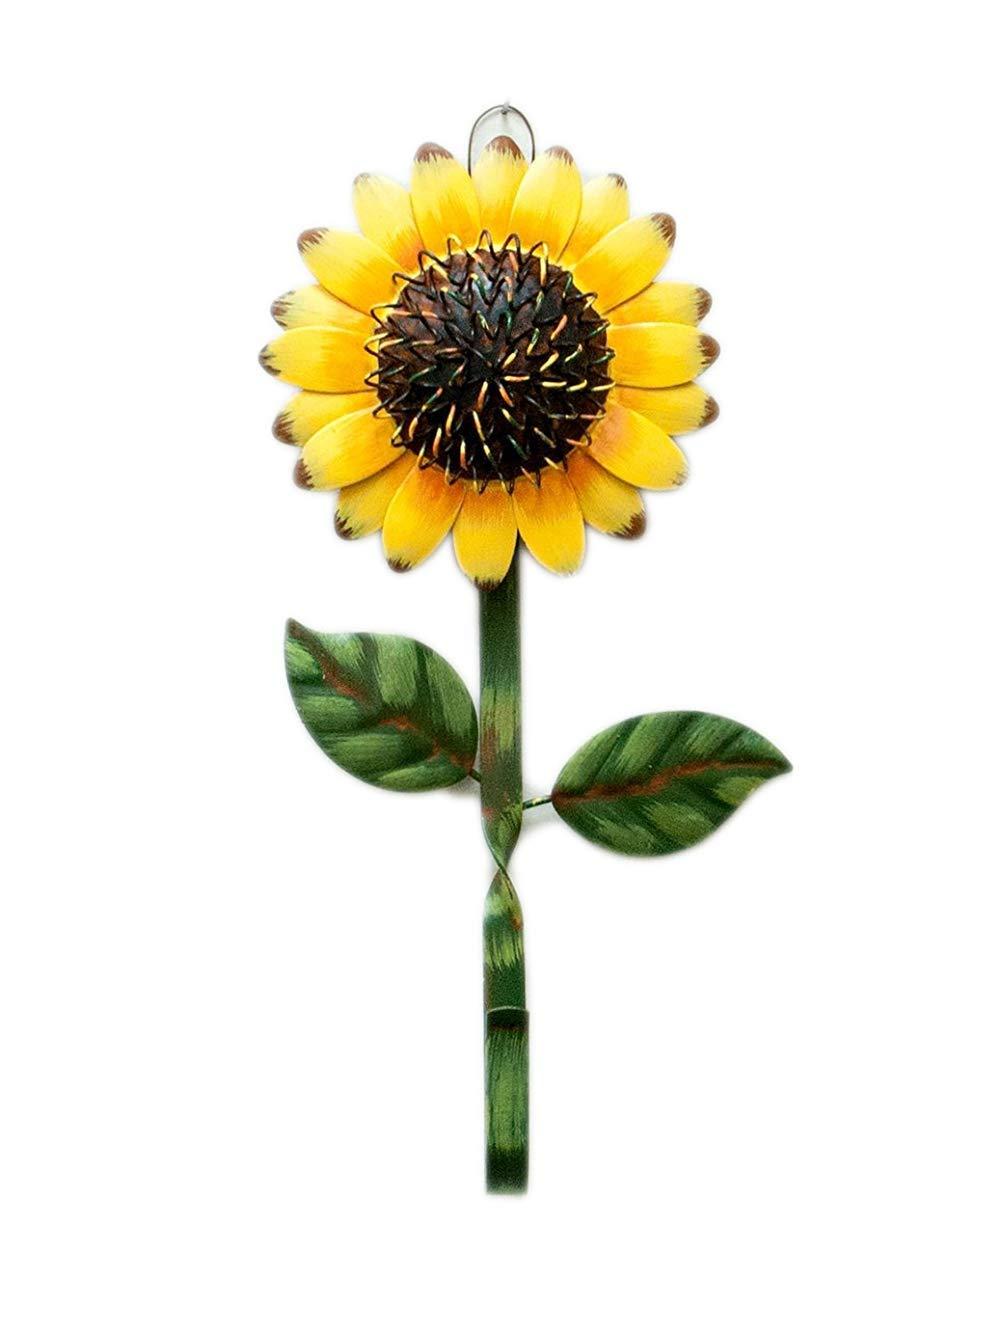 Single Wall Hook With Sunflower Design, Rustic Vintage Metal Key Hook Wall Hanger, Decorative Gift Idea (Sunflower)